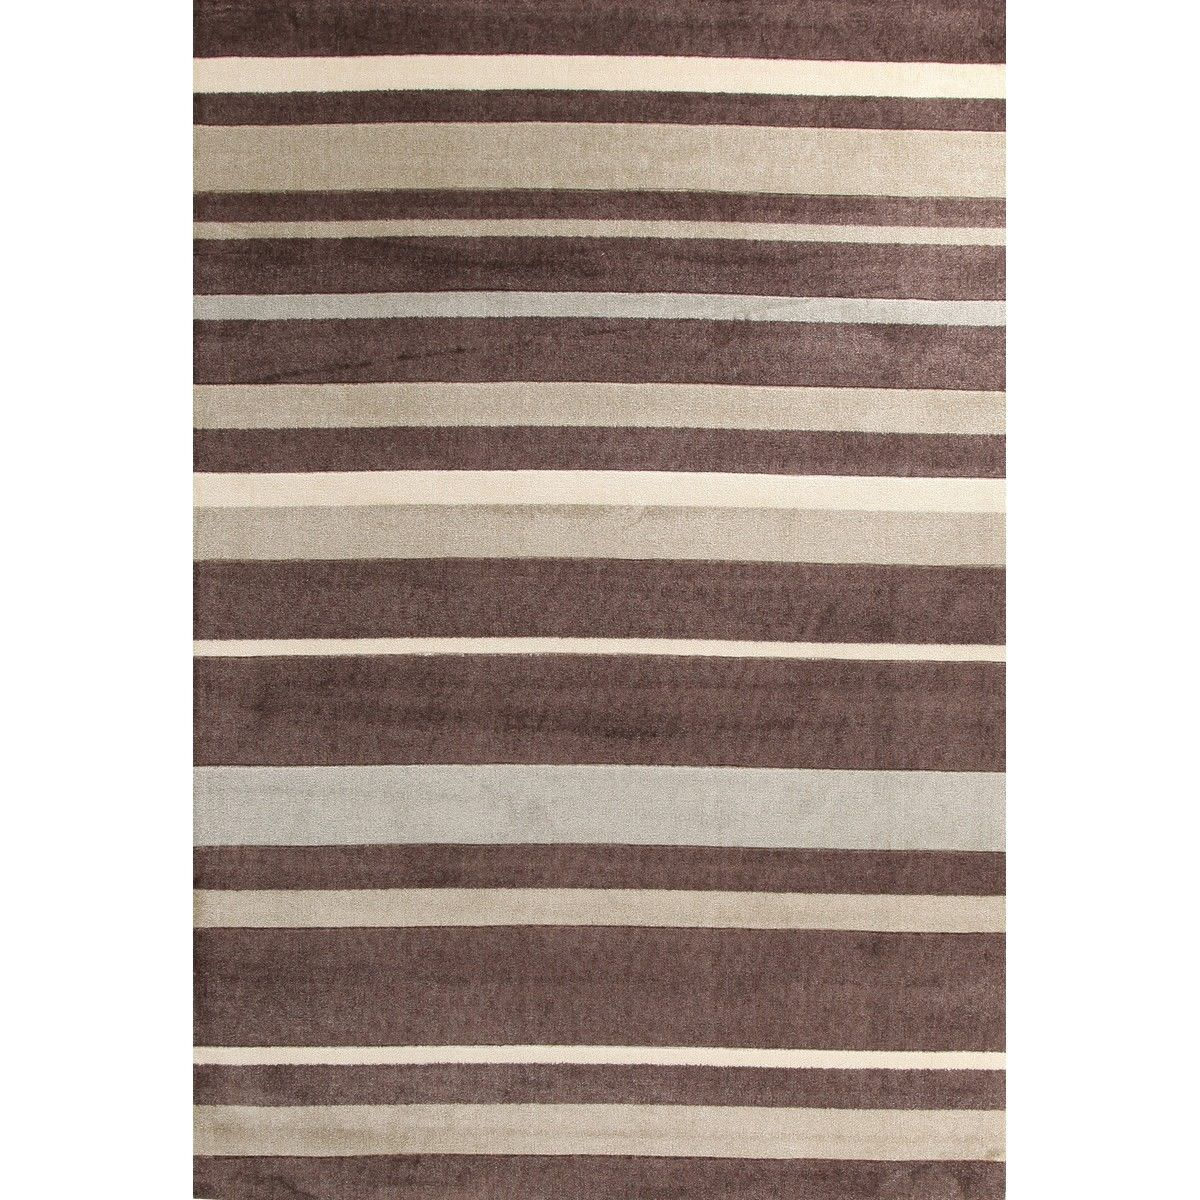 City Stylish Stripe Modern Rug, Beige 160x110cm, Brown / Taupe